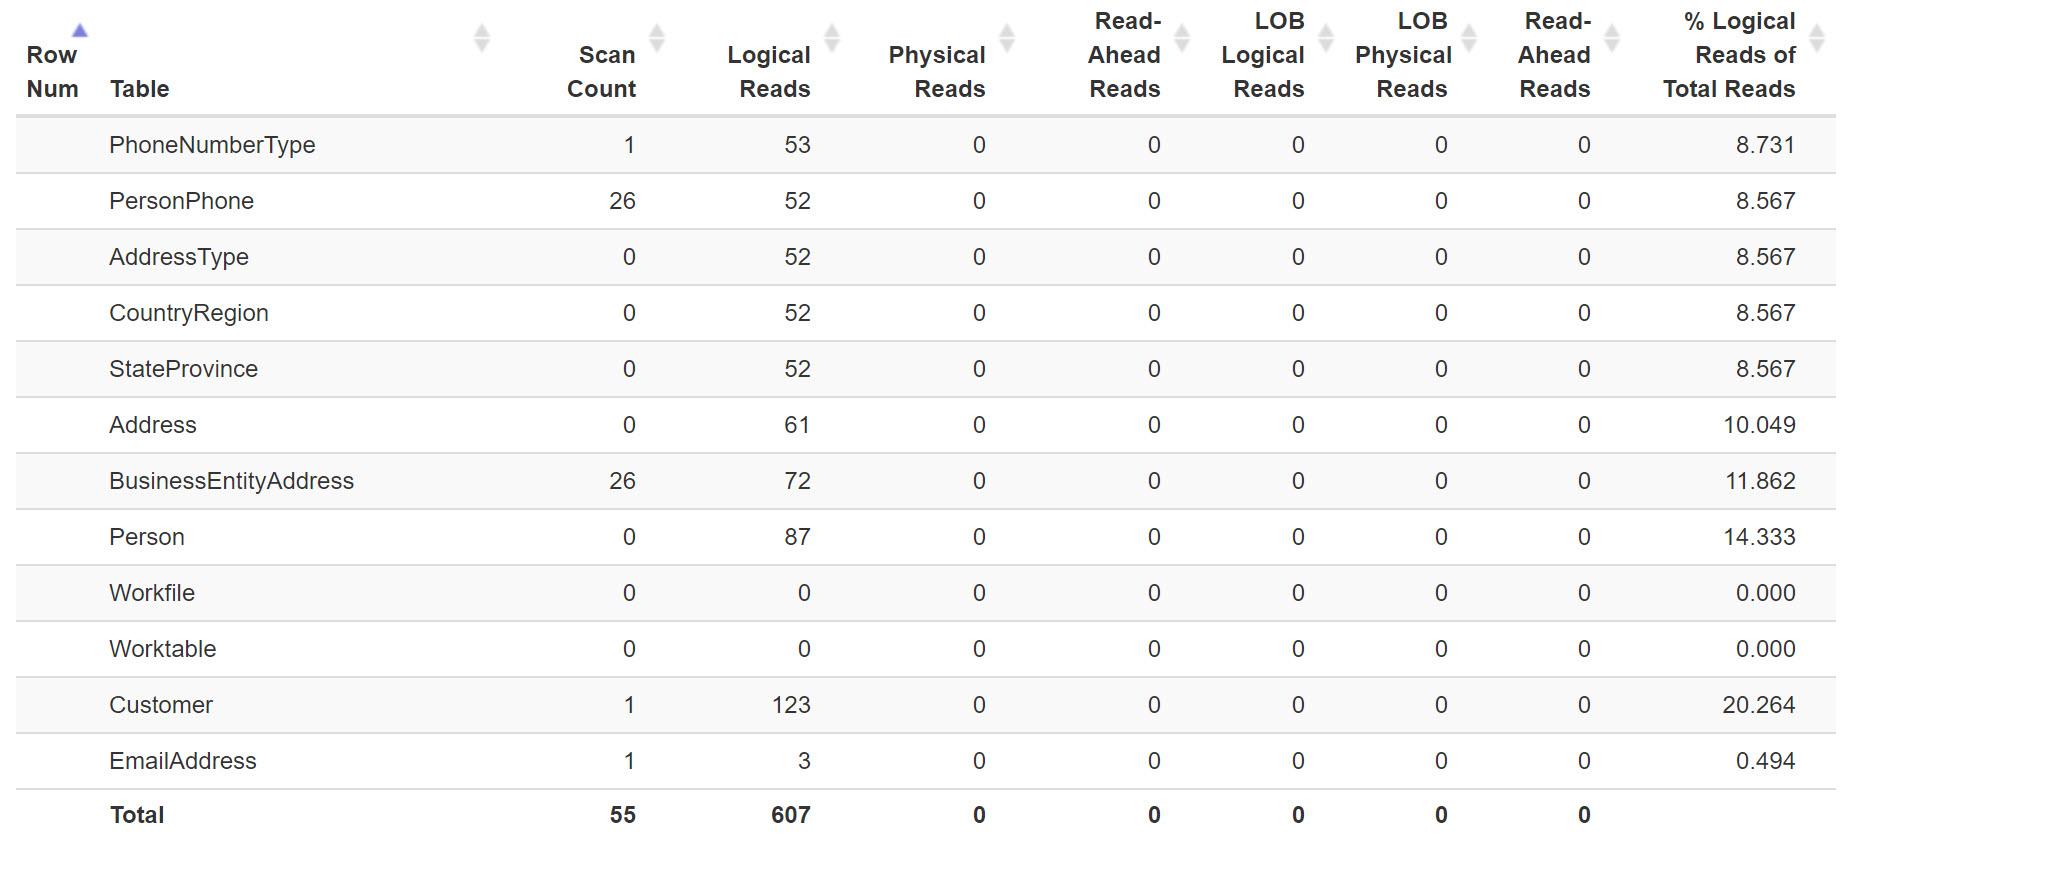 StatisticsParser.jpg